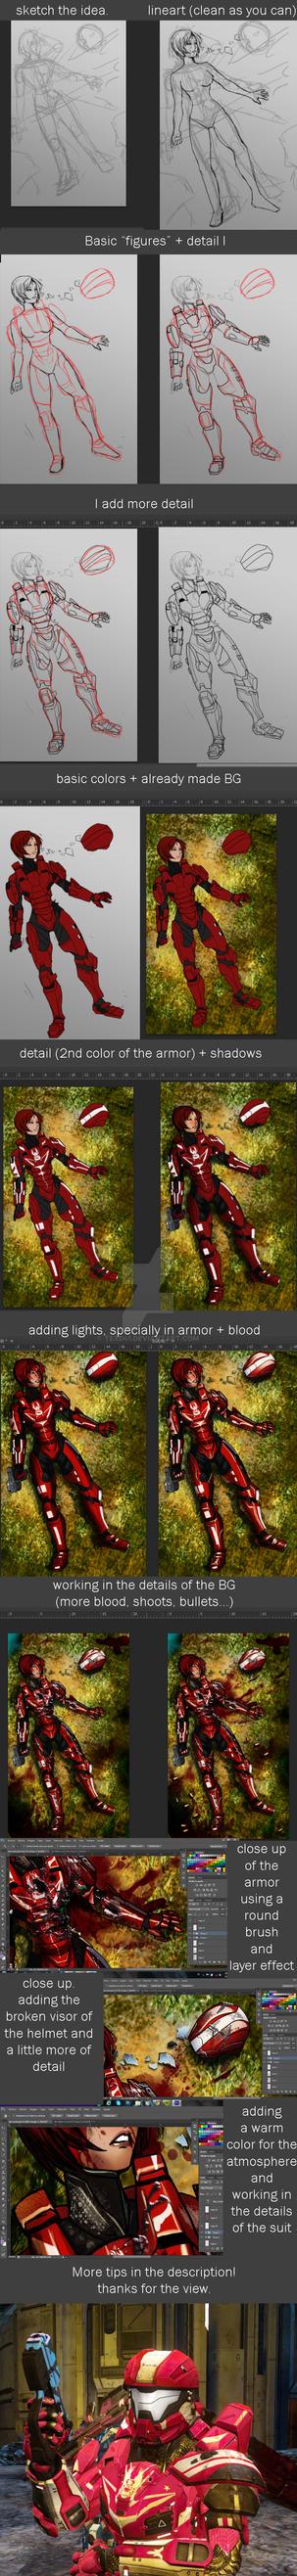 Spartan IV armor progress by WinterSpectrum